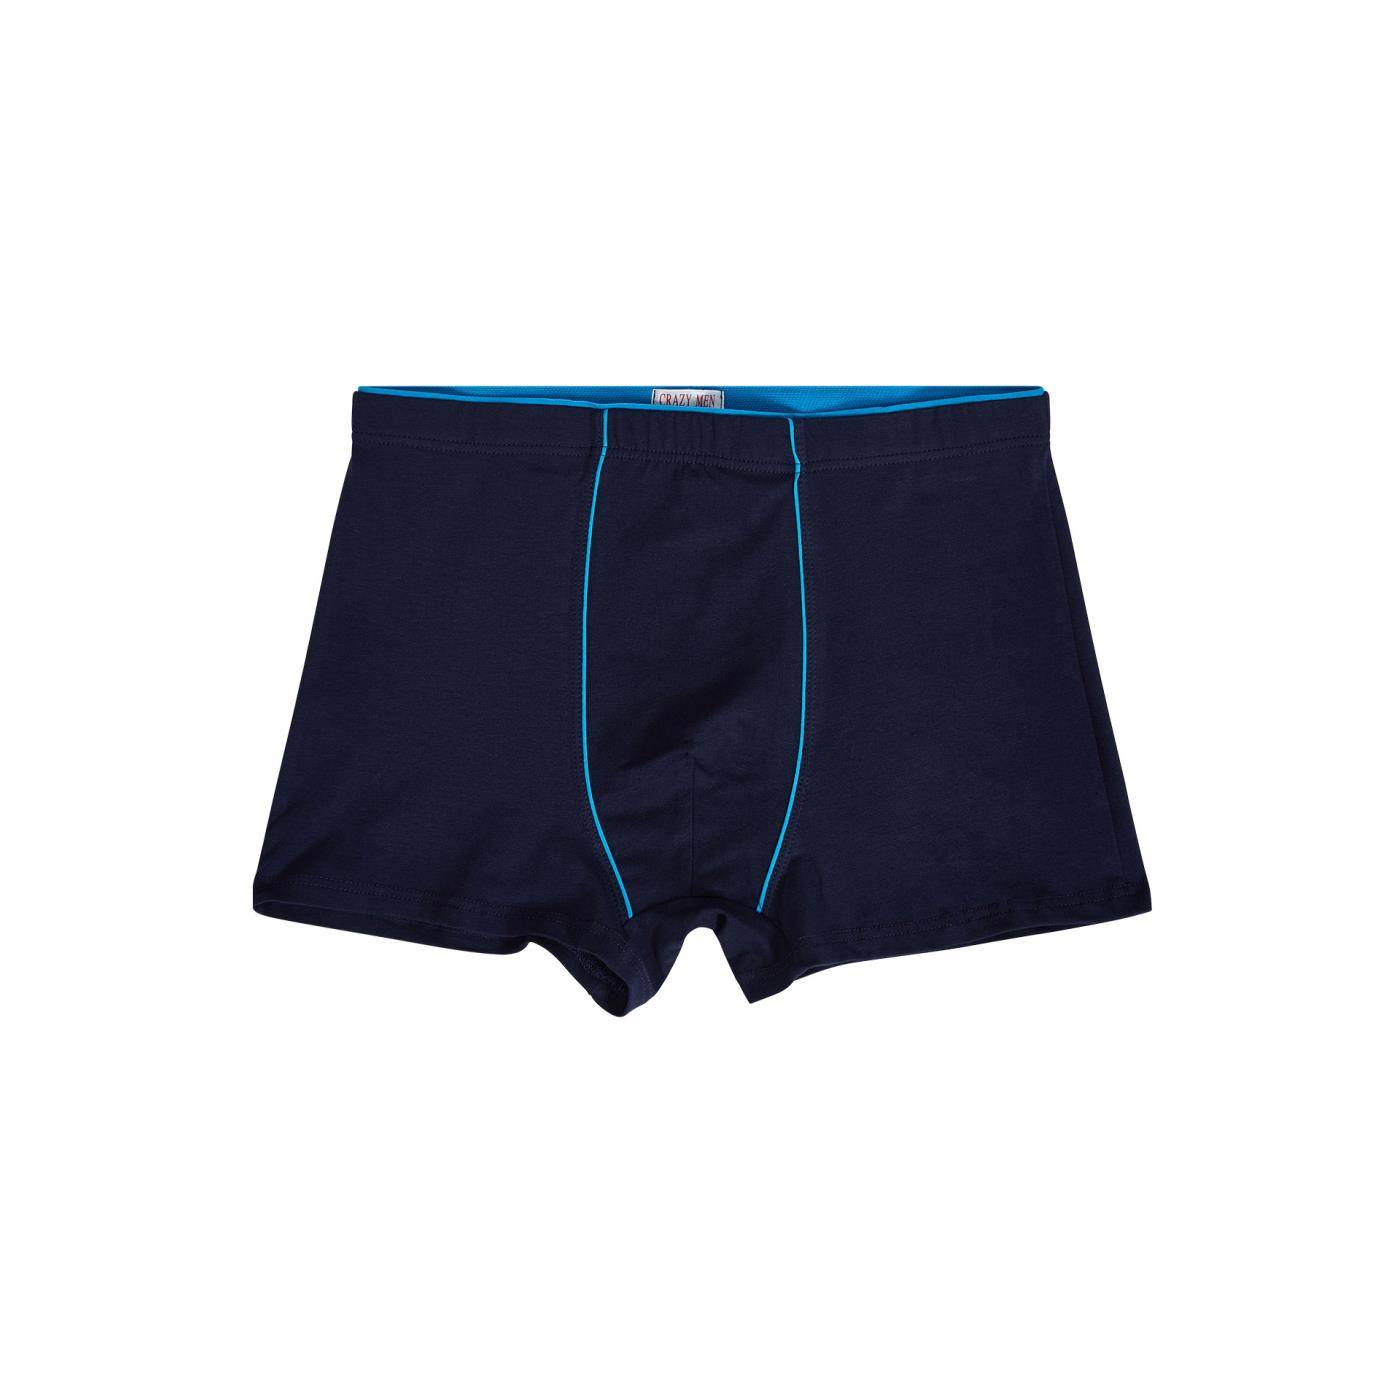 Celestino Ανδρικό boxer  - Σκουρο μπλε - Grootte: 2X-Large